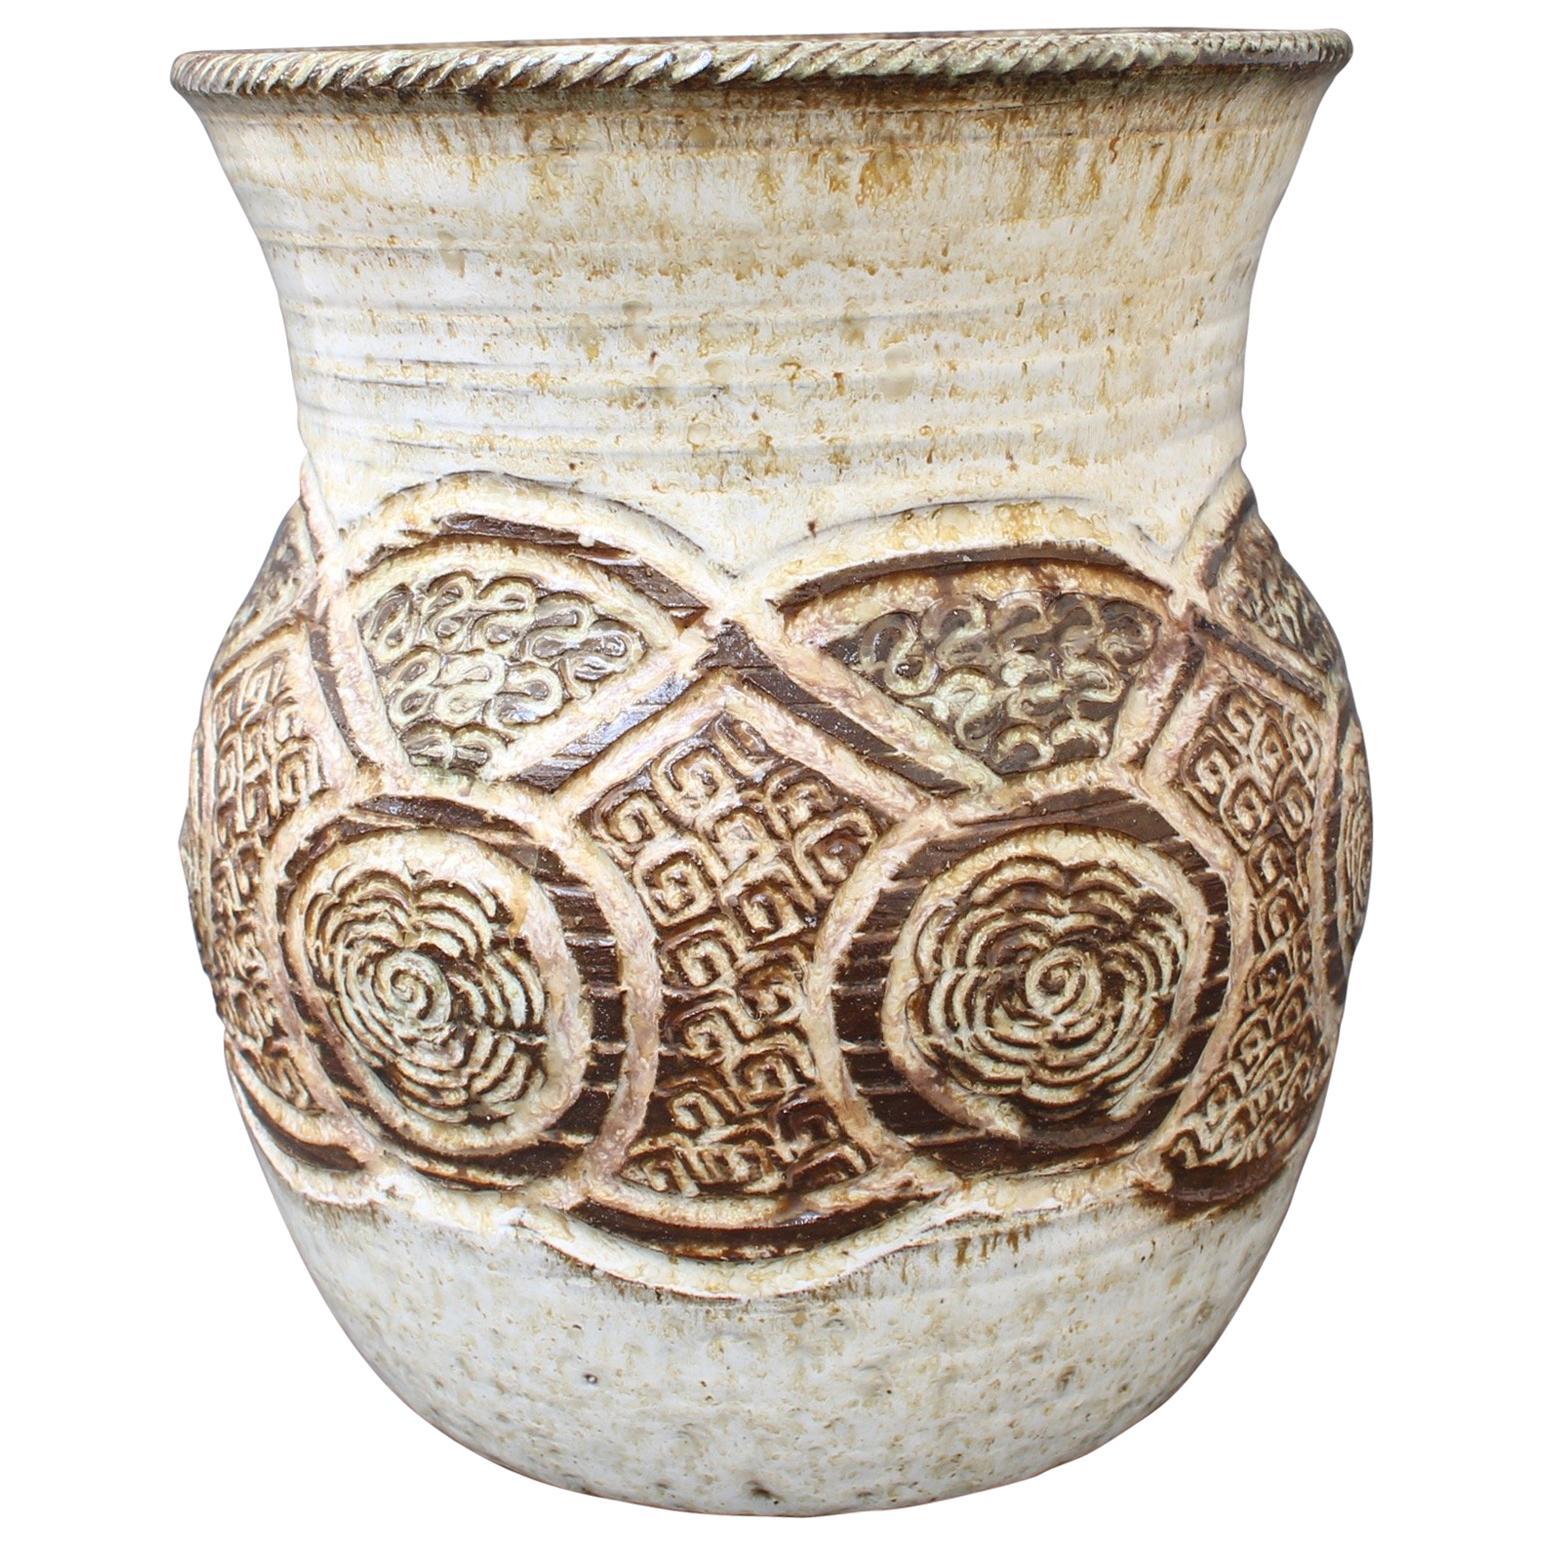 Ceramic Decorative Vase by Marcel Giraud, Vallauris, 'circa 1960s'